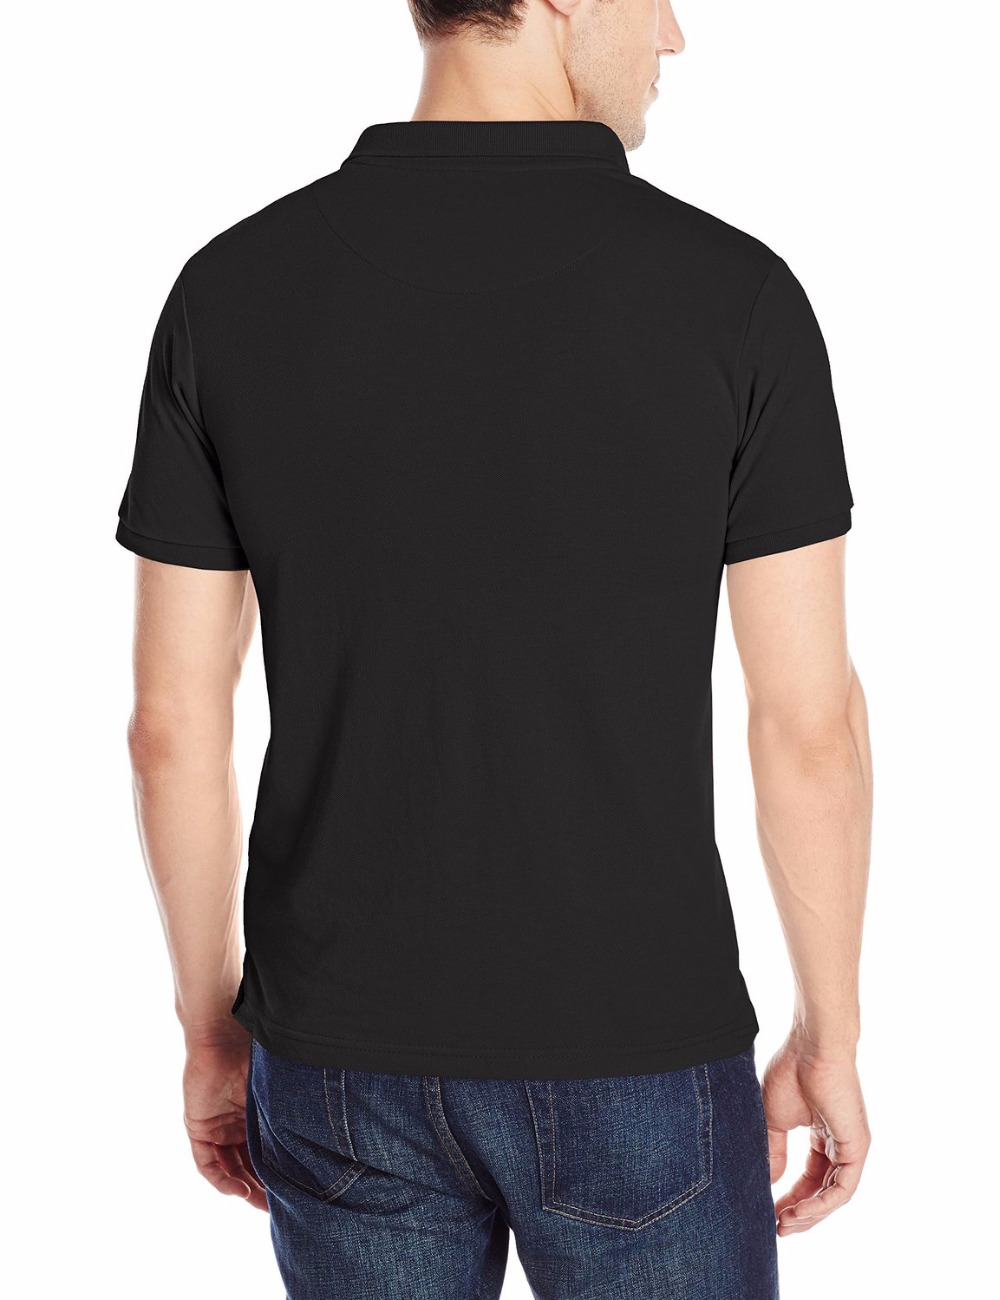 2018 Mens Polo Shirt Guns n Roses Rock Roll Print Polo Shirts Mens Shirts Camisa Polo Black White Cotton T-Shirts Top